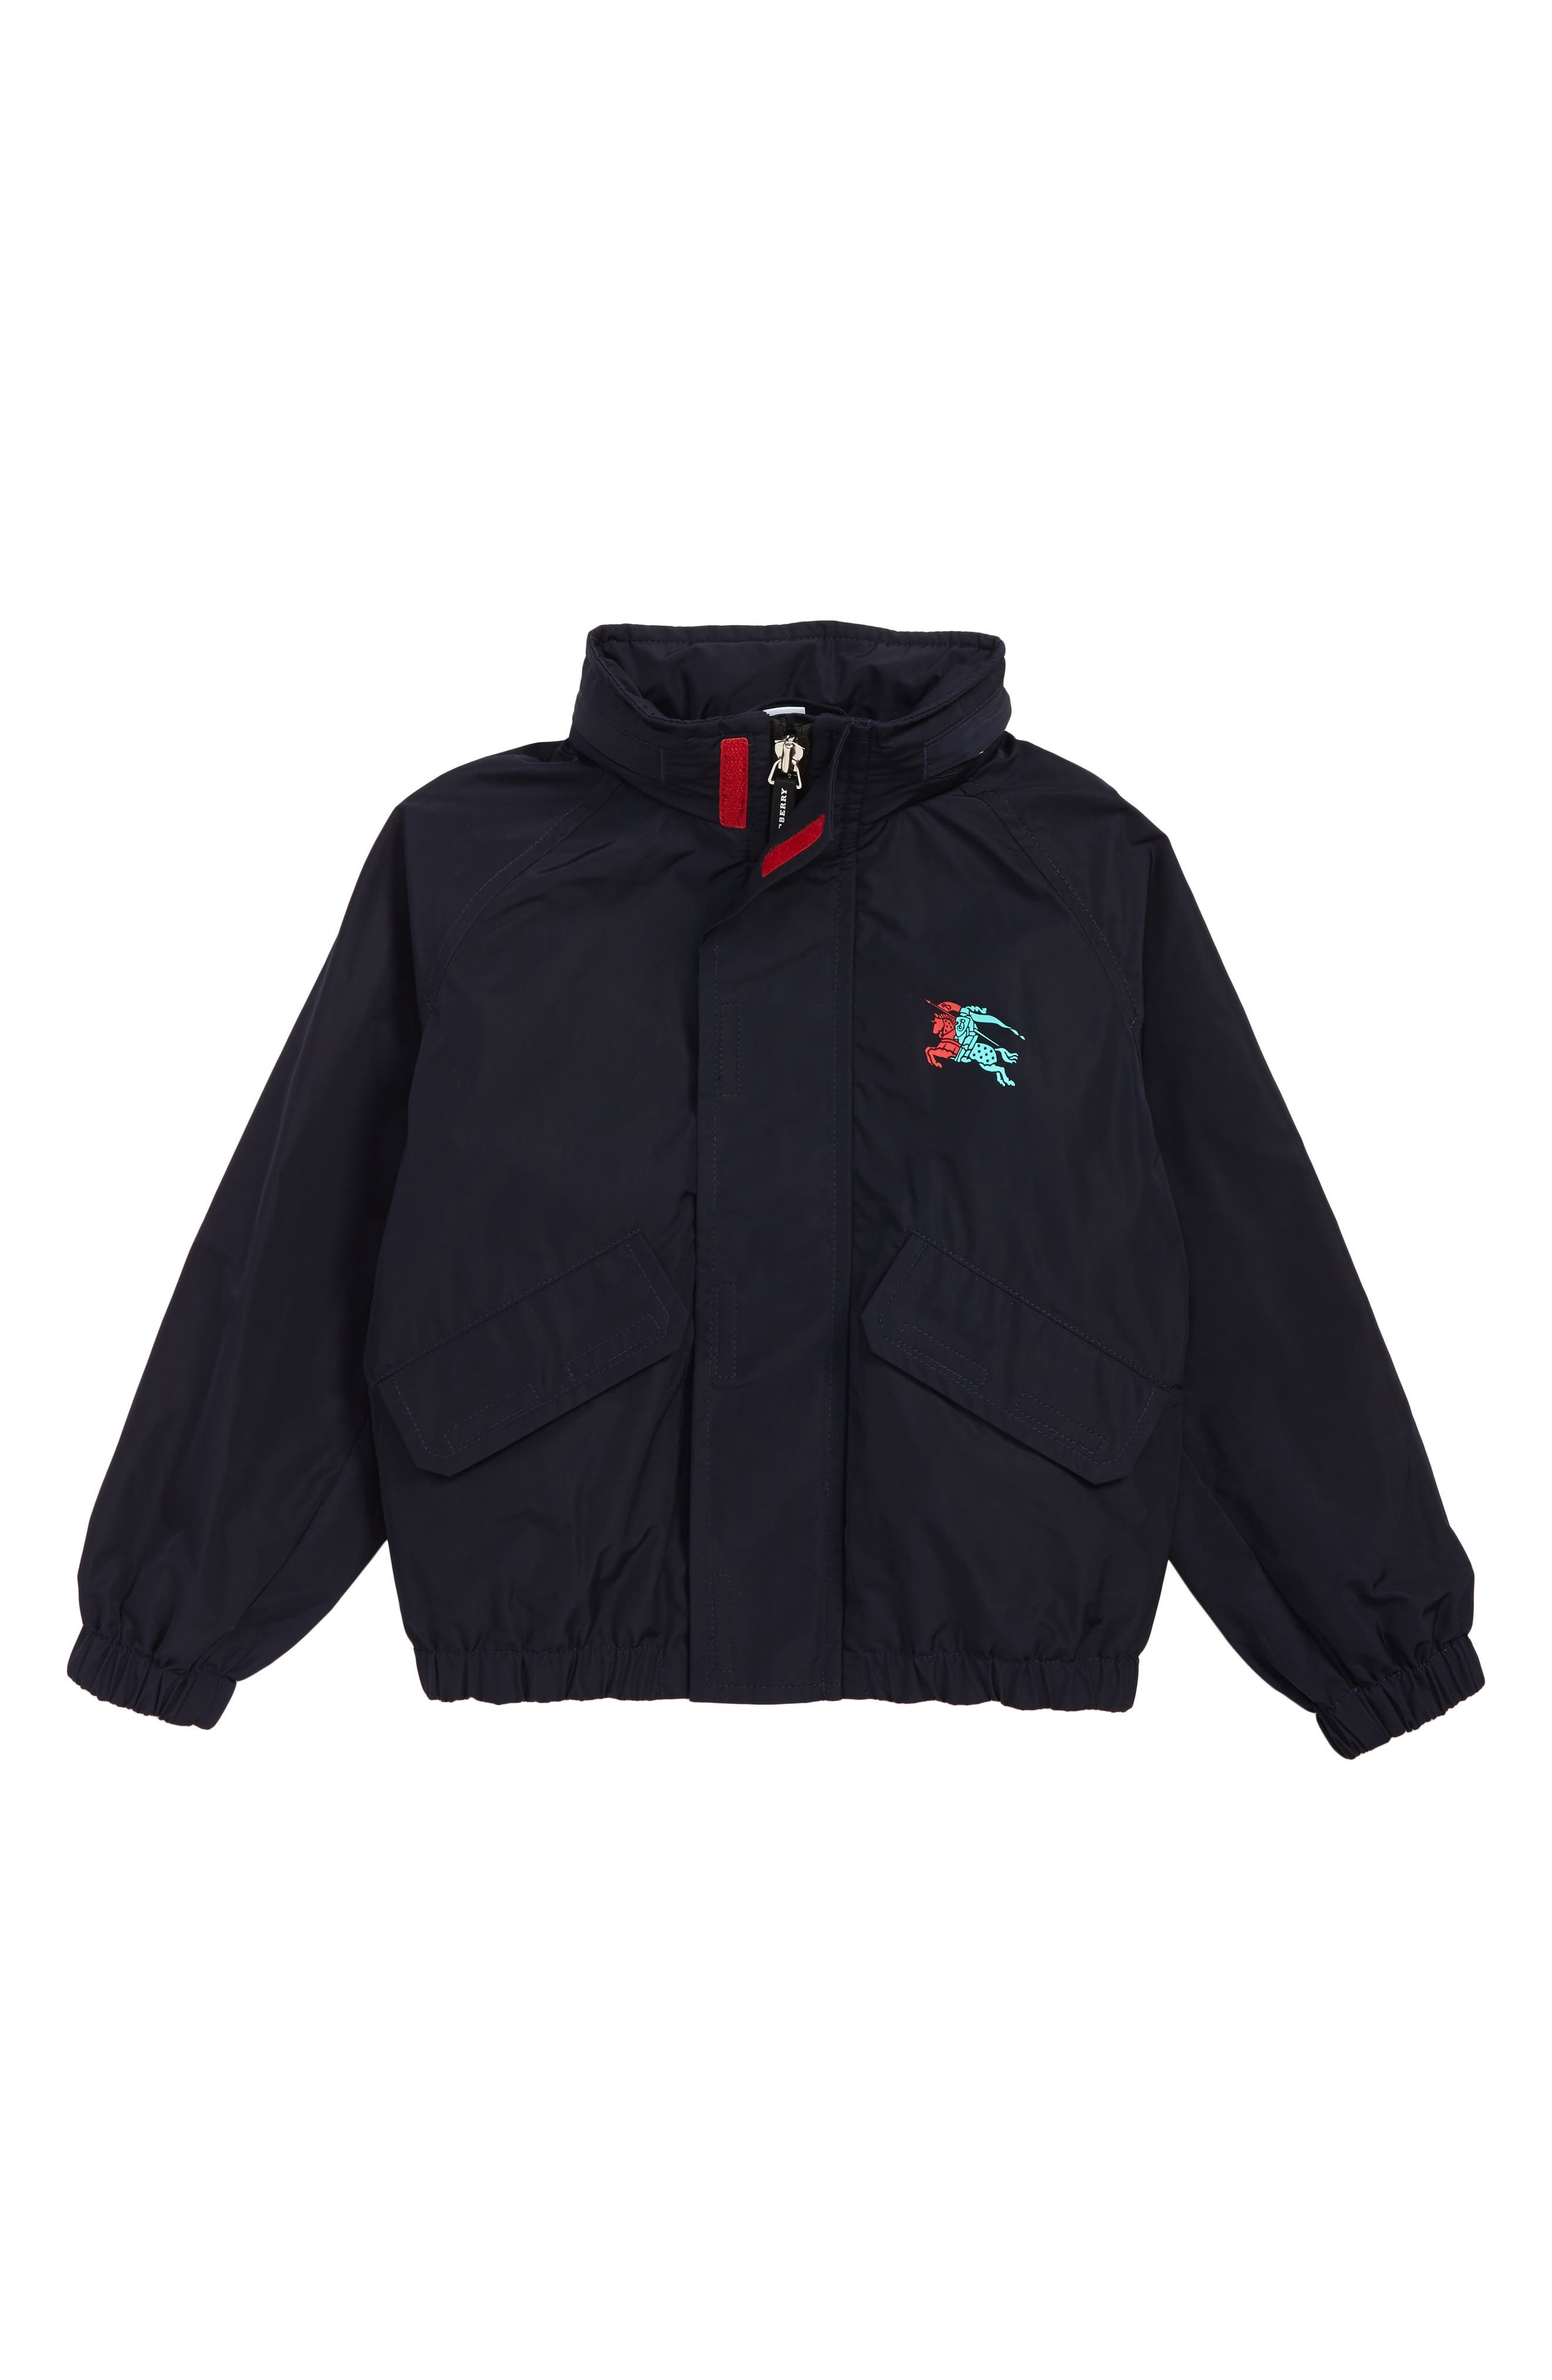 Easton Waterproof Hooded Jacket,                             Main thumbnail 1, color,                             NAVY